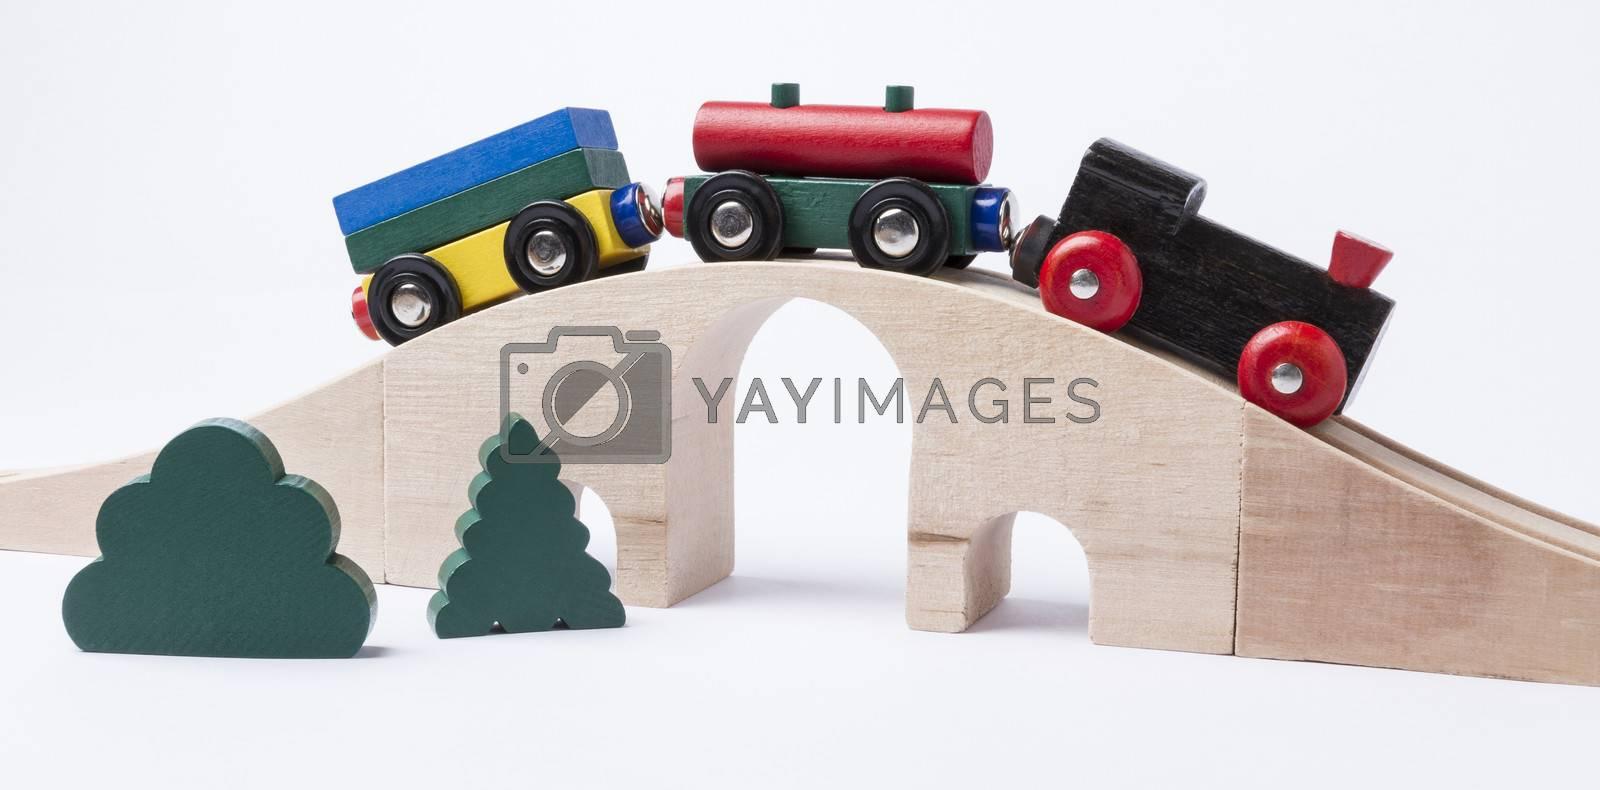 wooden toy train on bridge in grey background. horizontal image